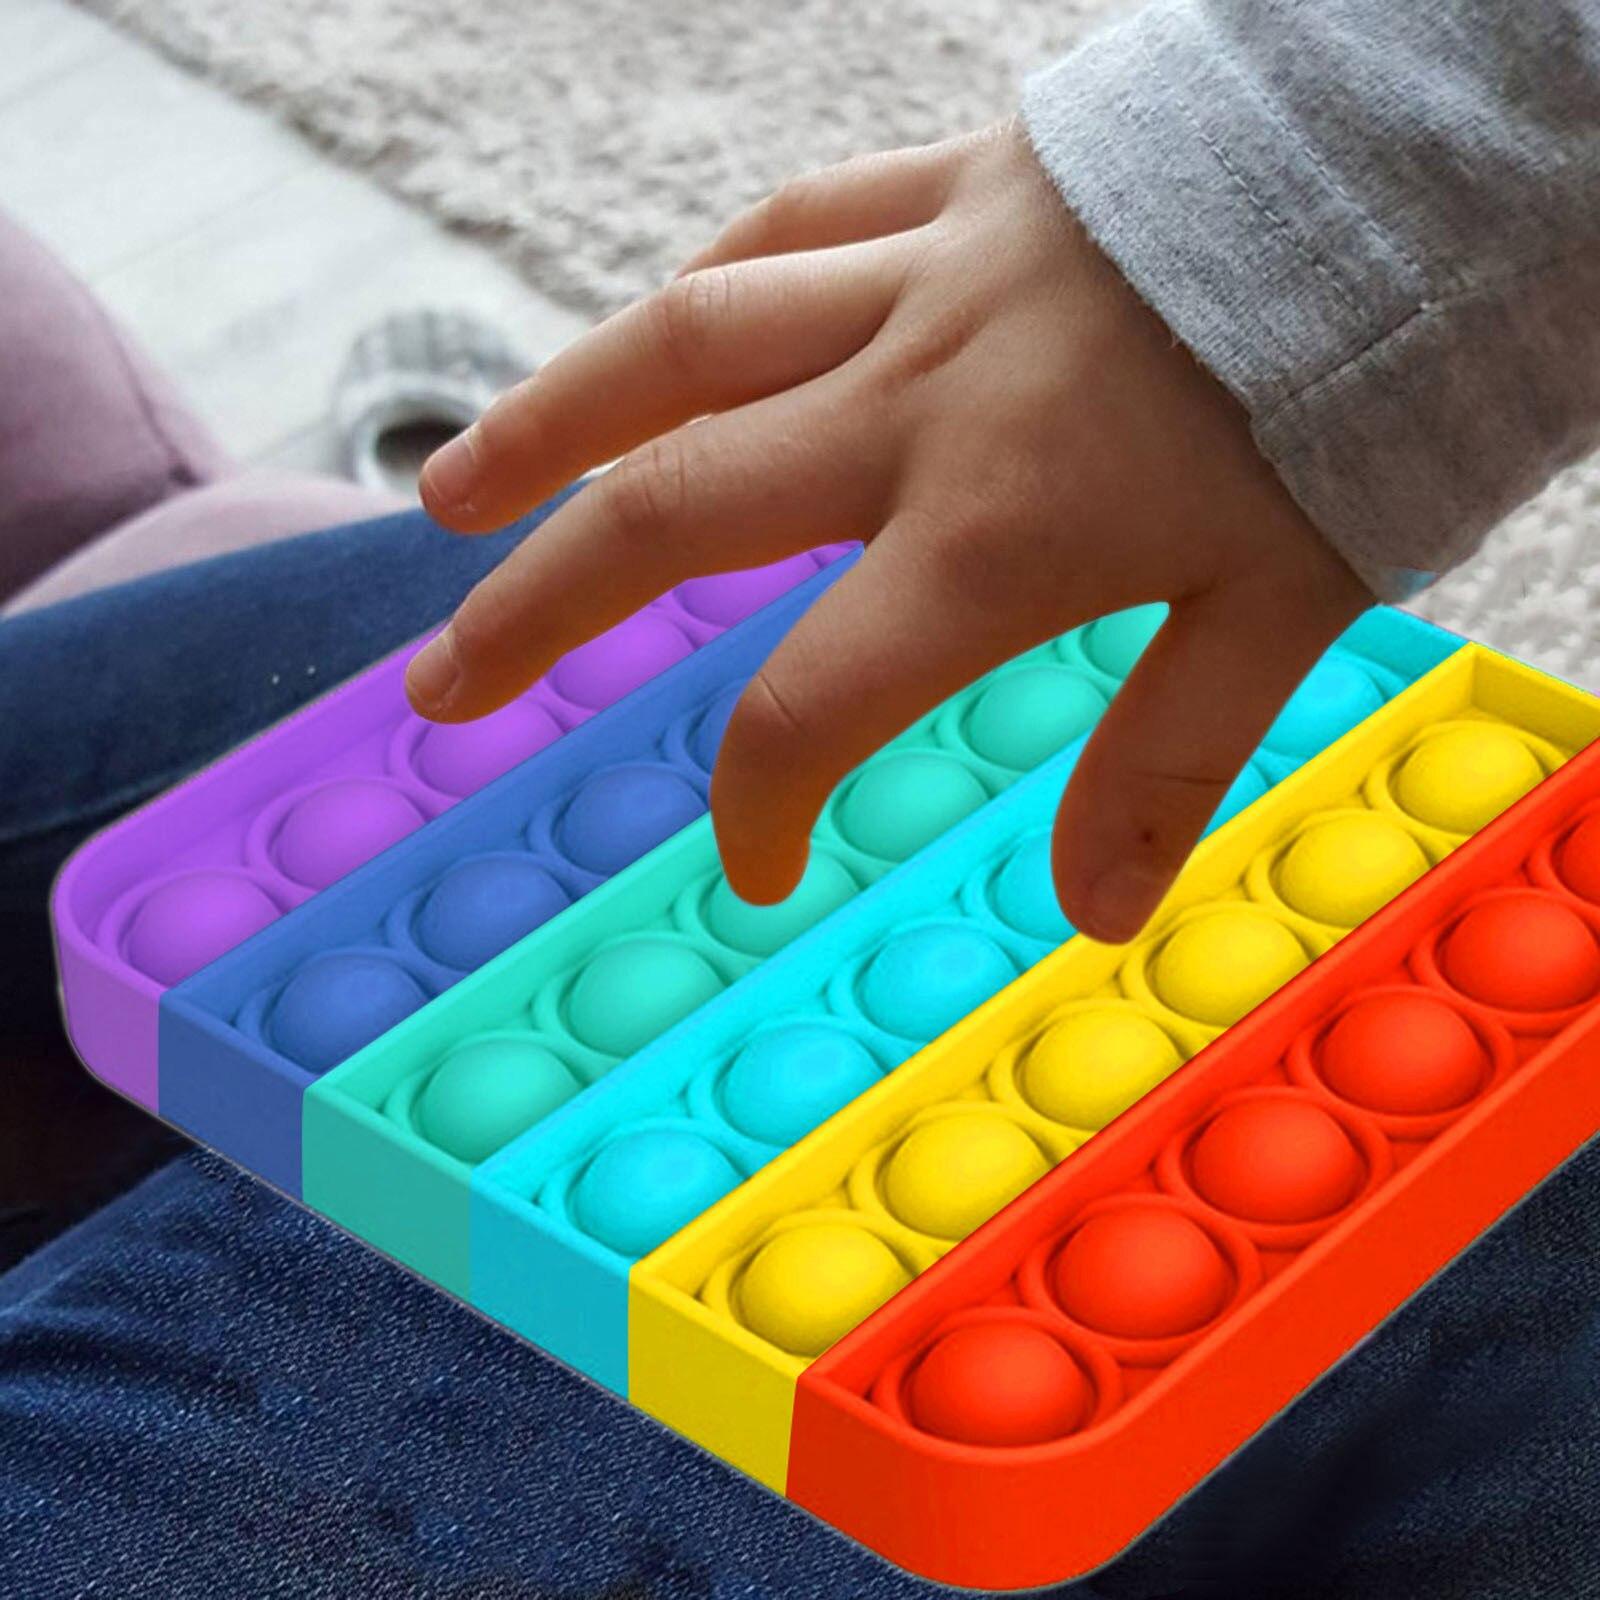 It-Fidget-Toy Reliever-Toys Anti-Stress Bubble-Sensory Pops Funny Popit Popp Push Child img4